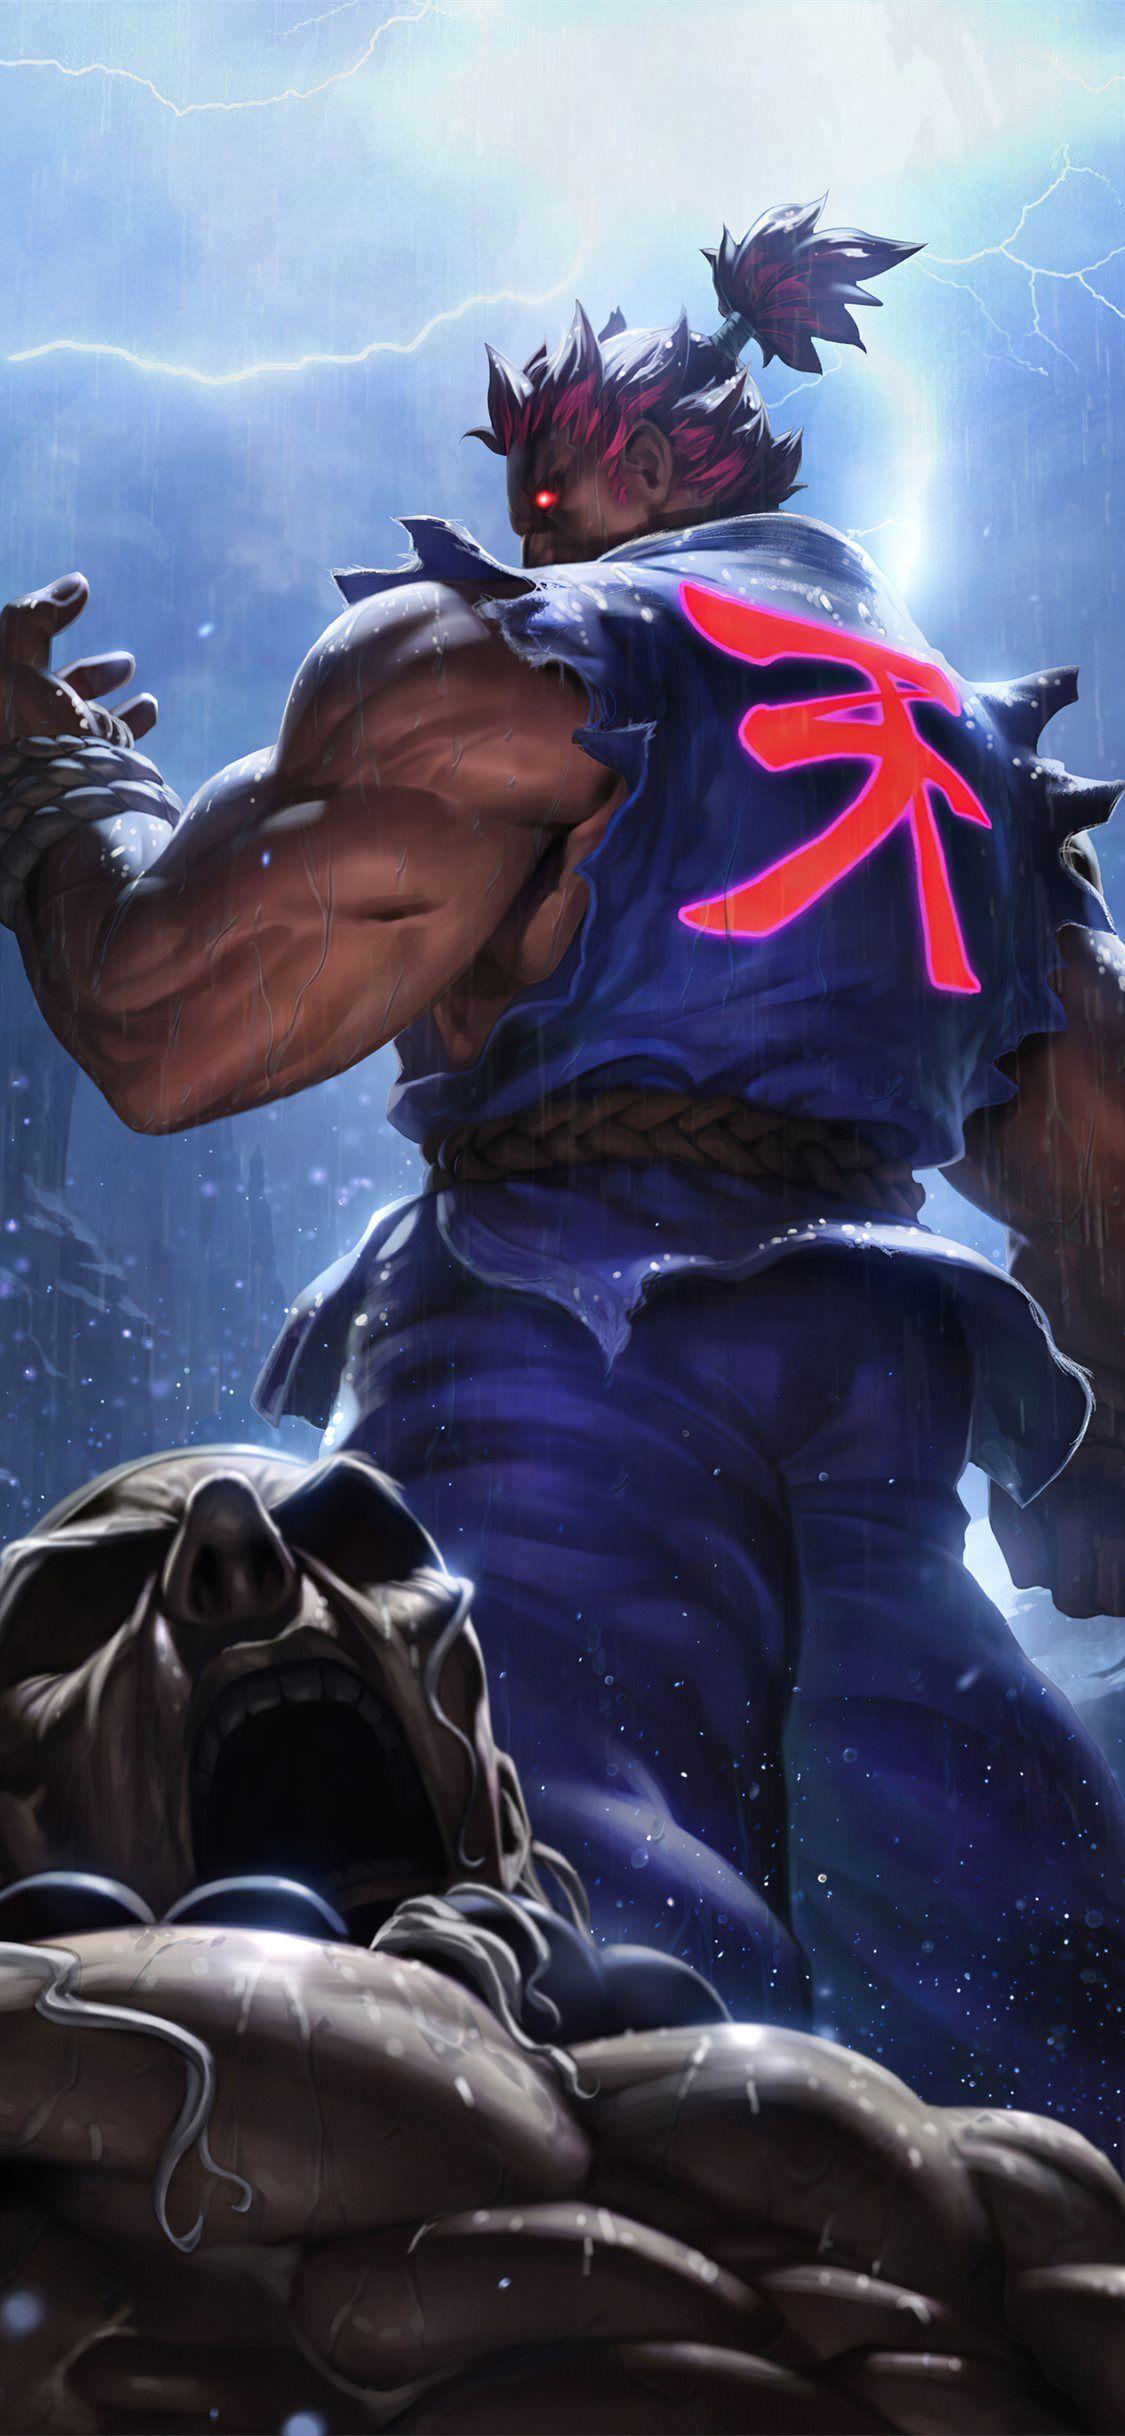 Akuma Street Fighter Game 4k Streetfighterv Games 2019games 4k Artstation Iphonex Street Fighter Wallpaper Street Fighter Characters Akuma Street Fighter